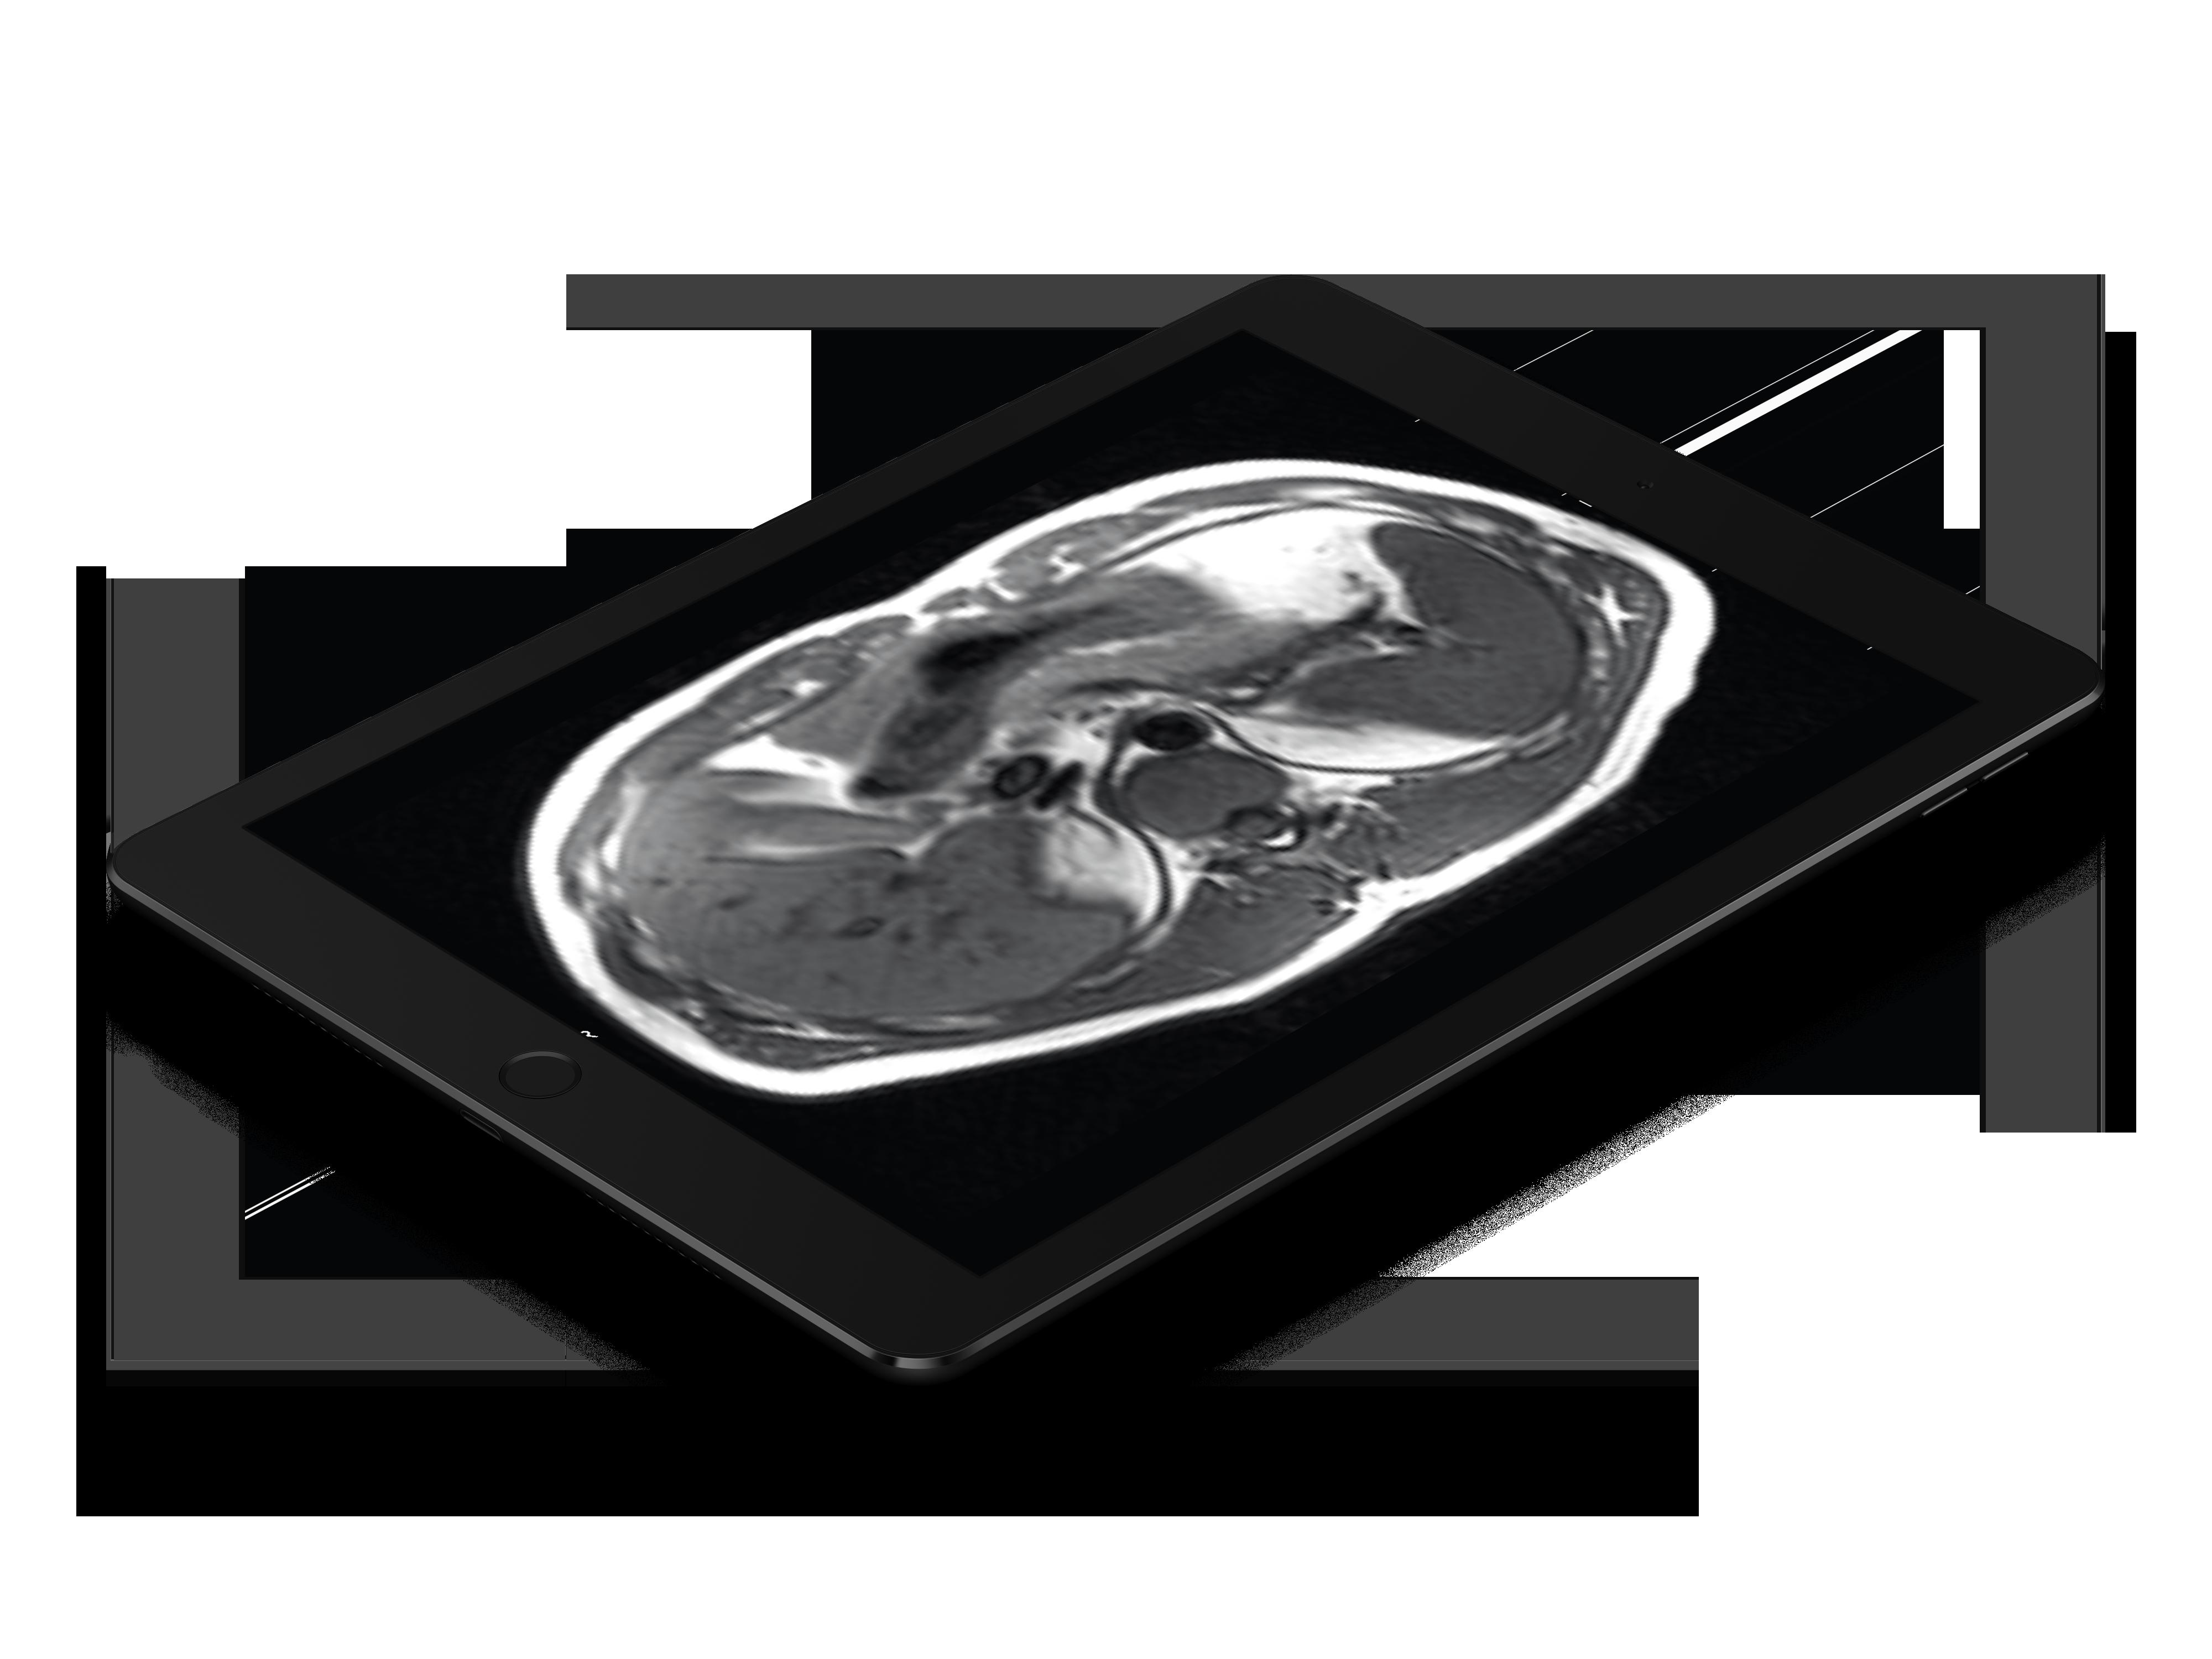 teleradiology-pacs-tablet